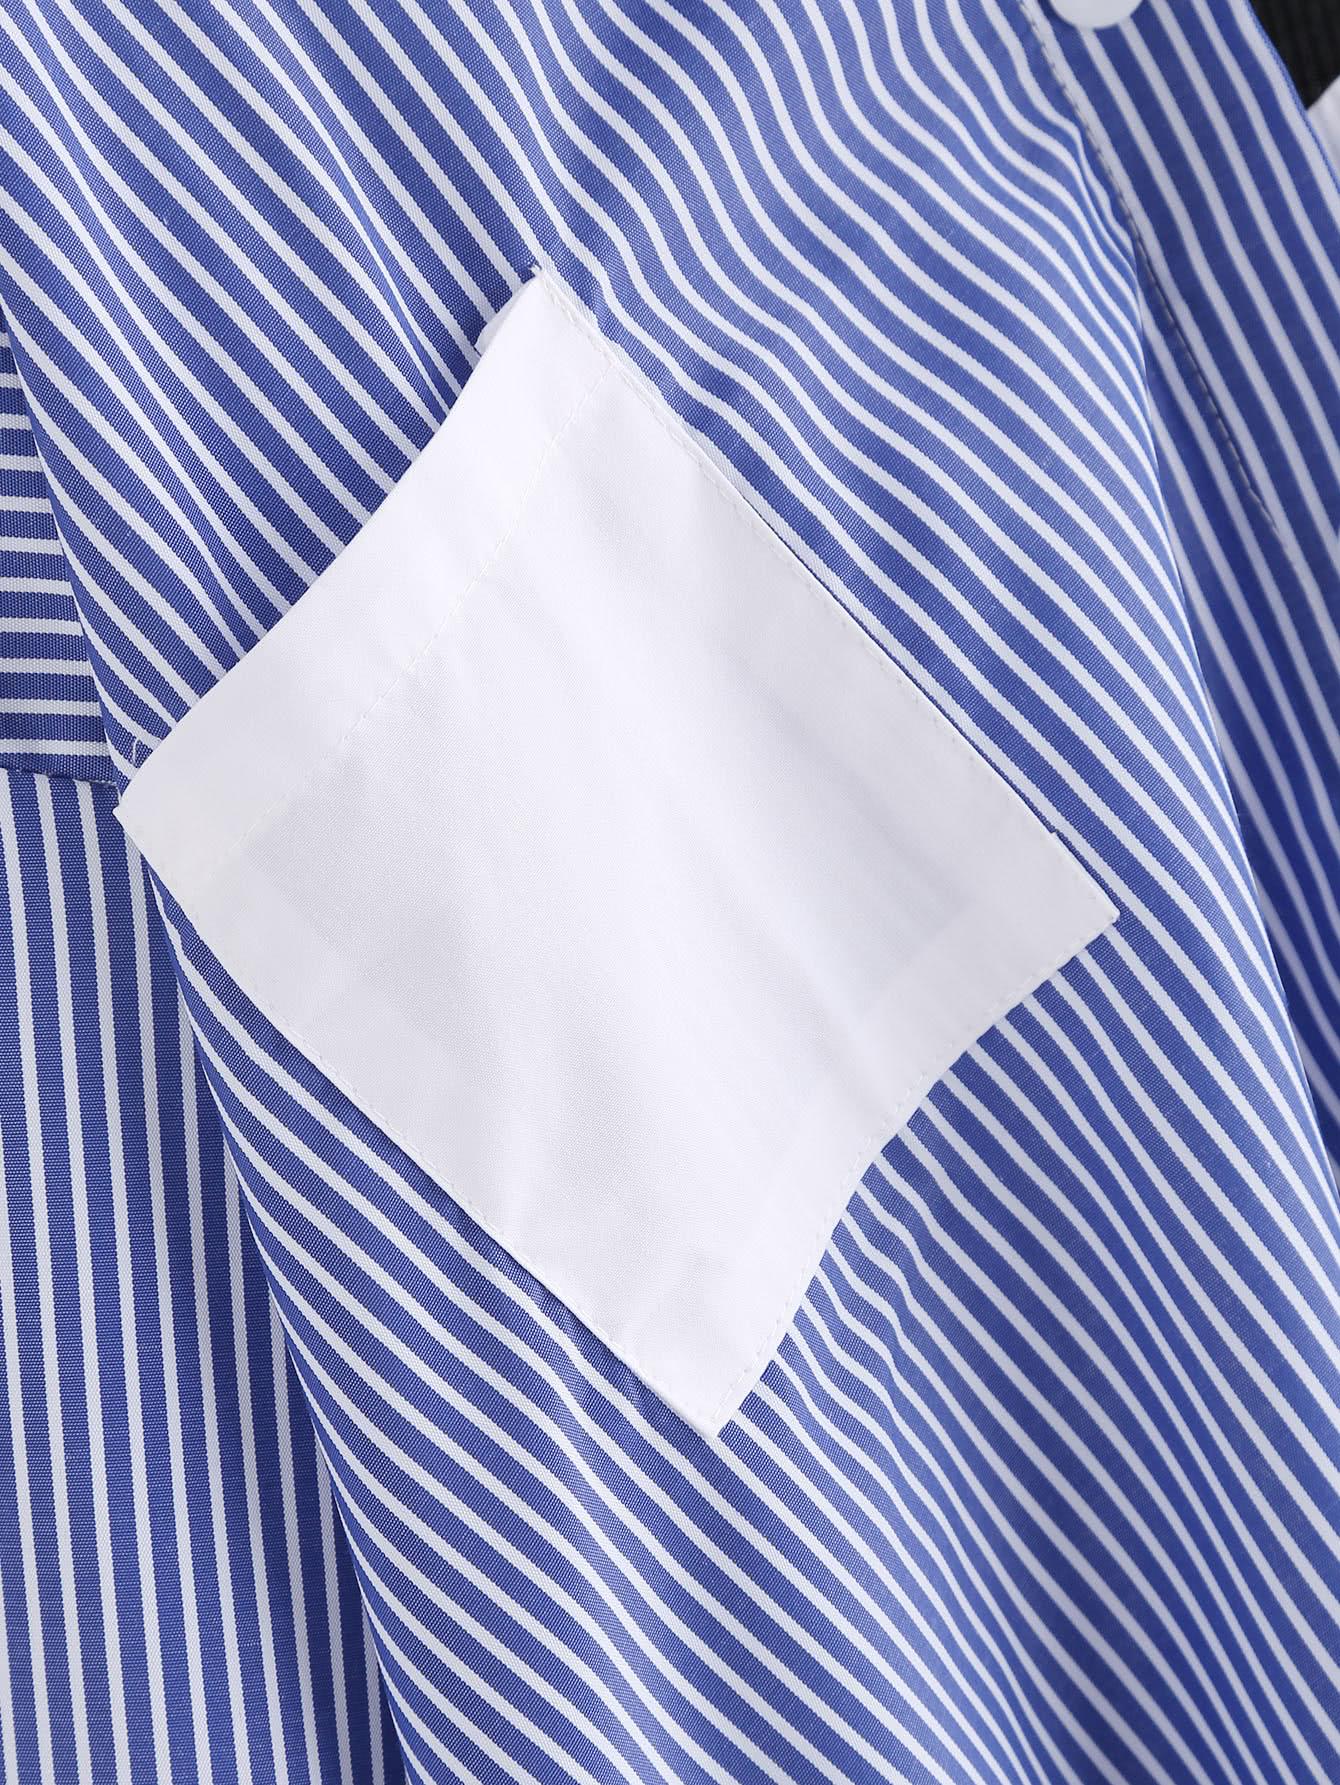 Asymmetric Open Shoulder Contrast Striped Dip Hem Blouse